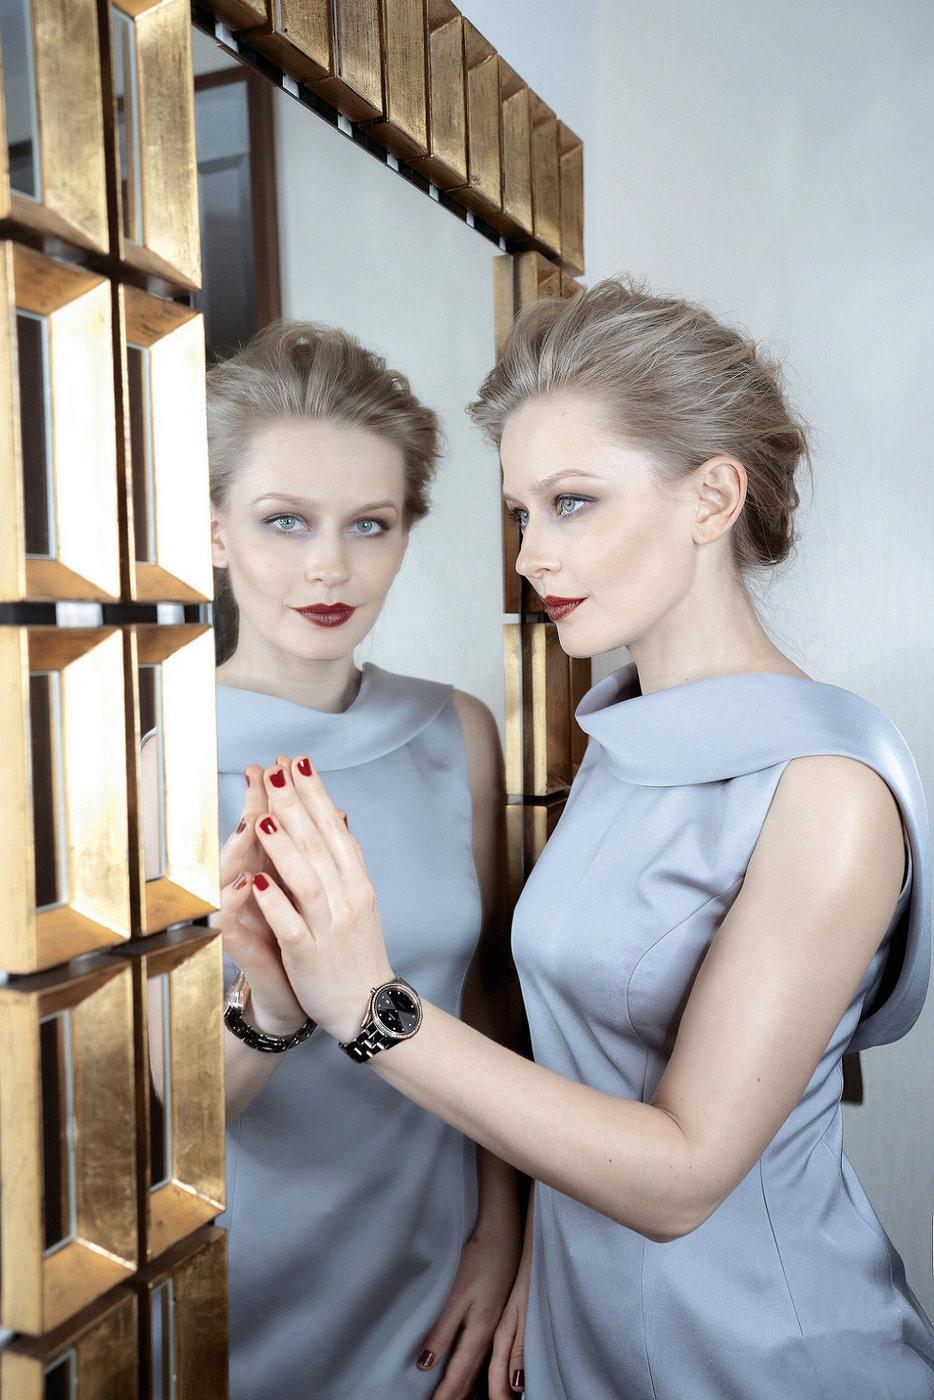 Yulia Peresild's Choice On Exquisite Rado Replica Watches